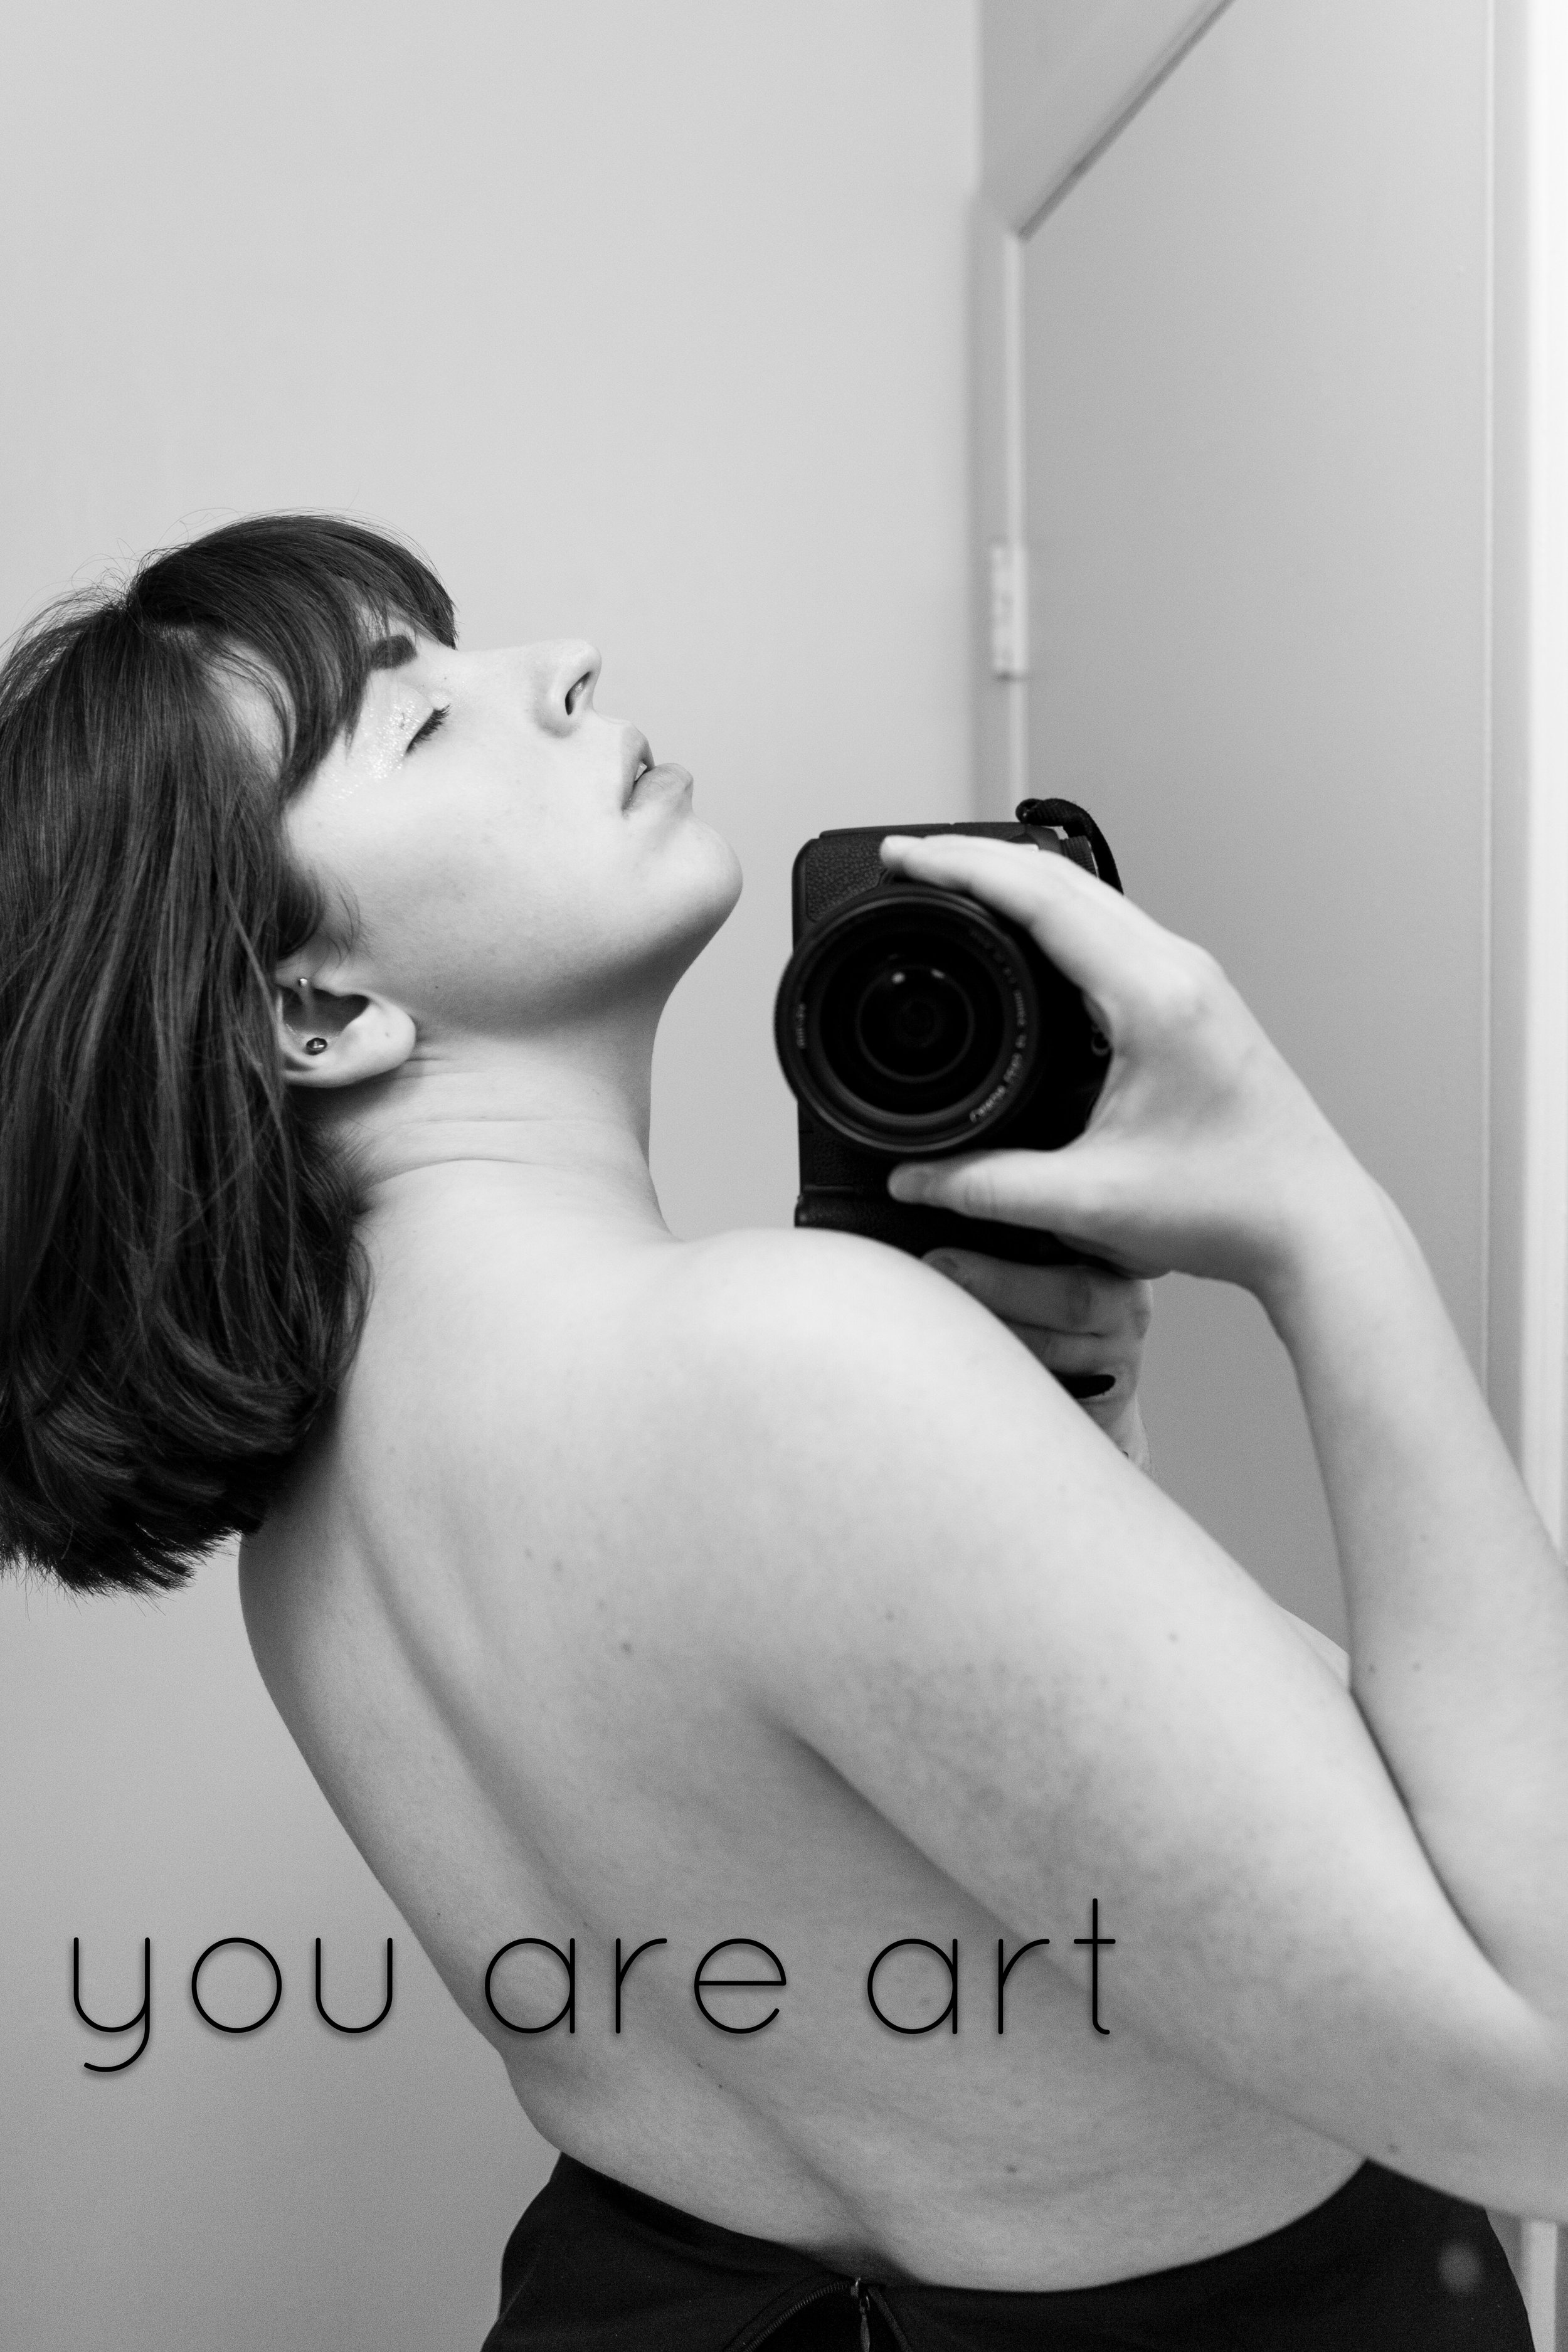 self-portrait empowerment